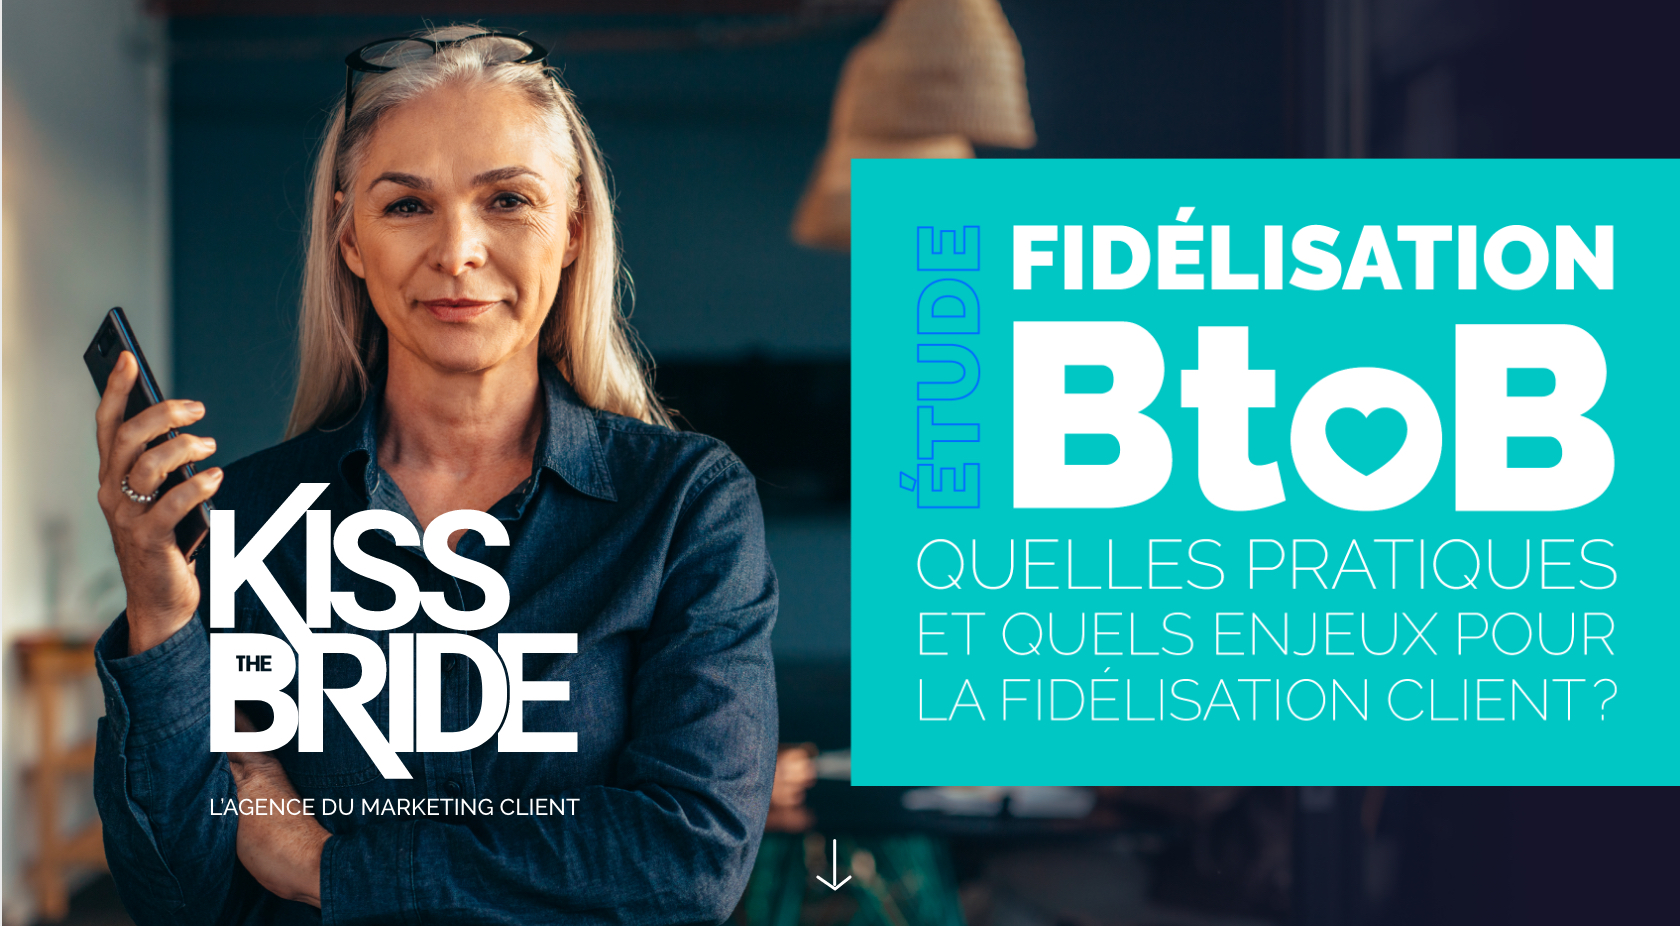 Kiss The Bride Etude Fidélisation BtoB